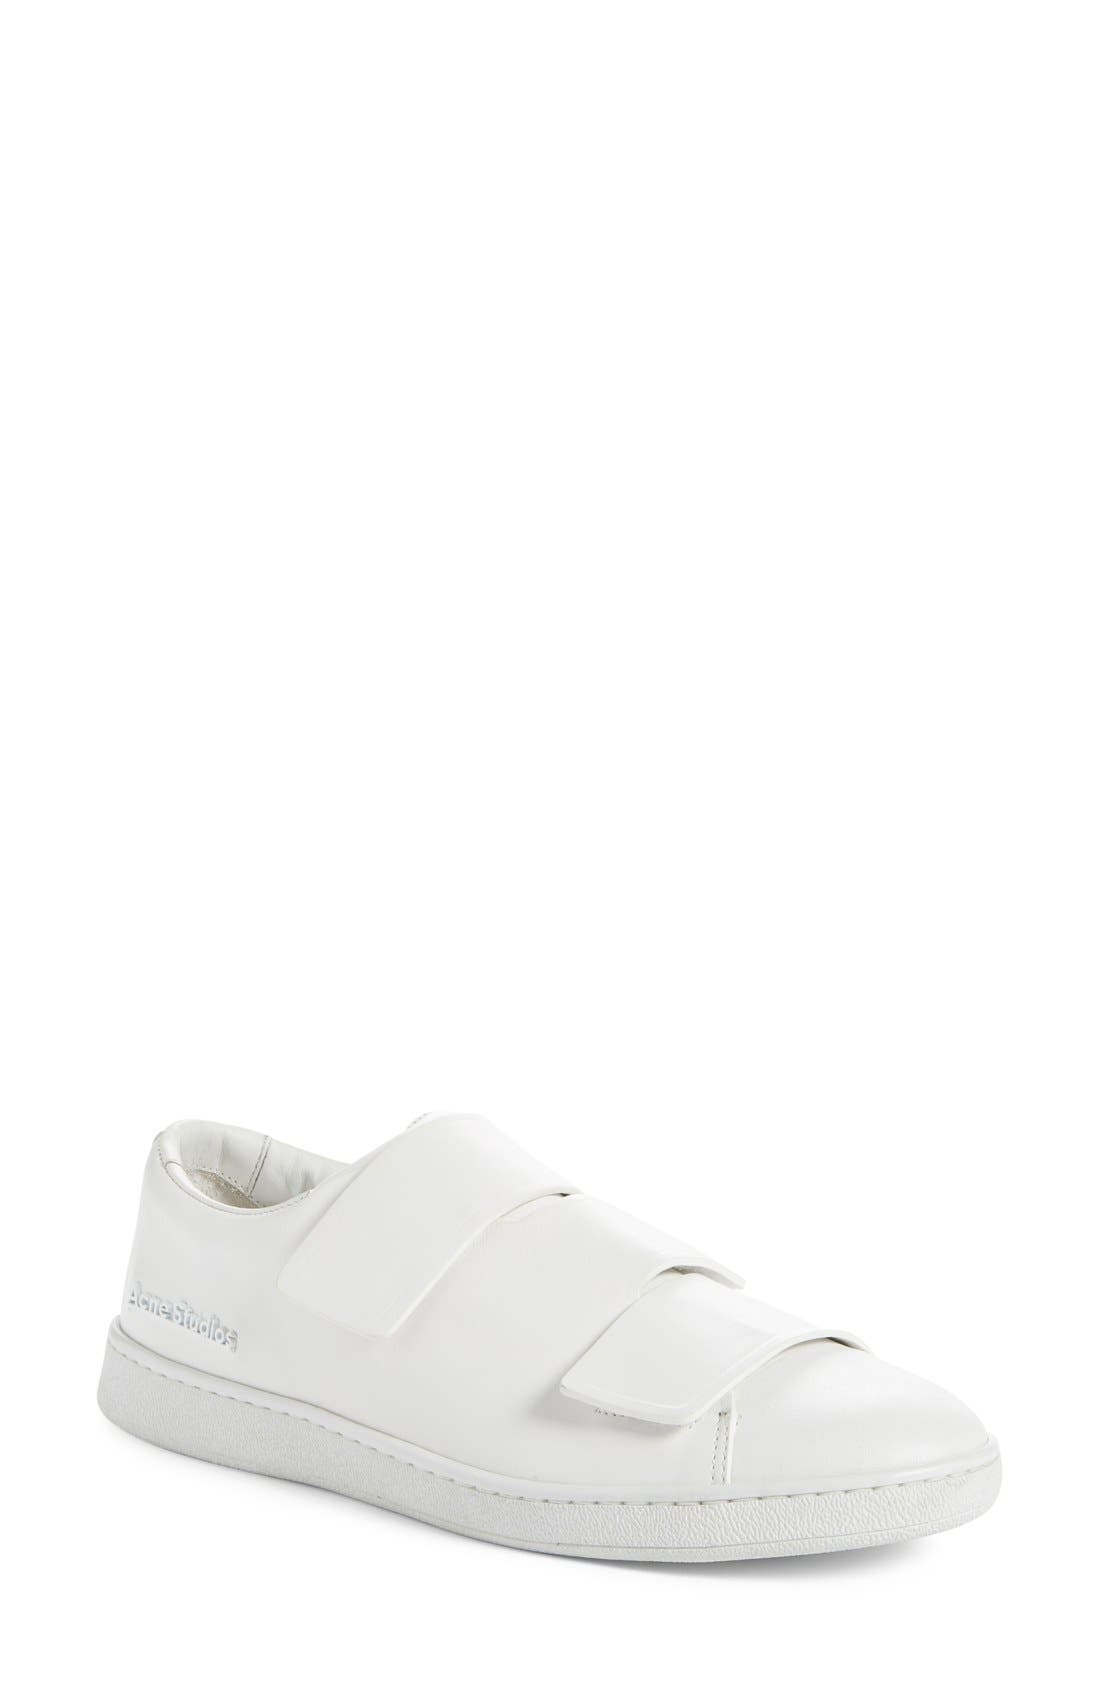 Main Image - Acne Studios Triple Strap Sneaker (Women)